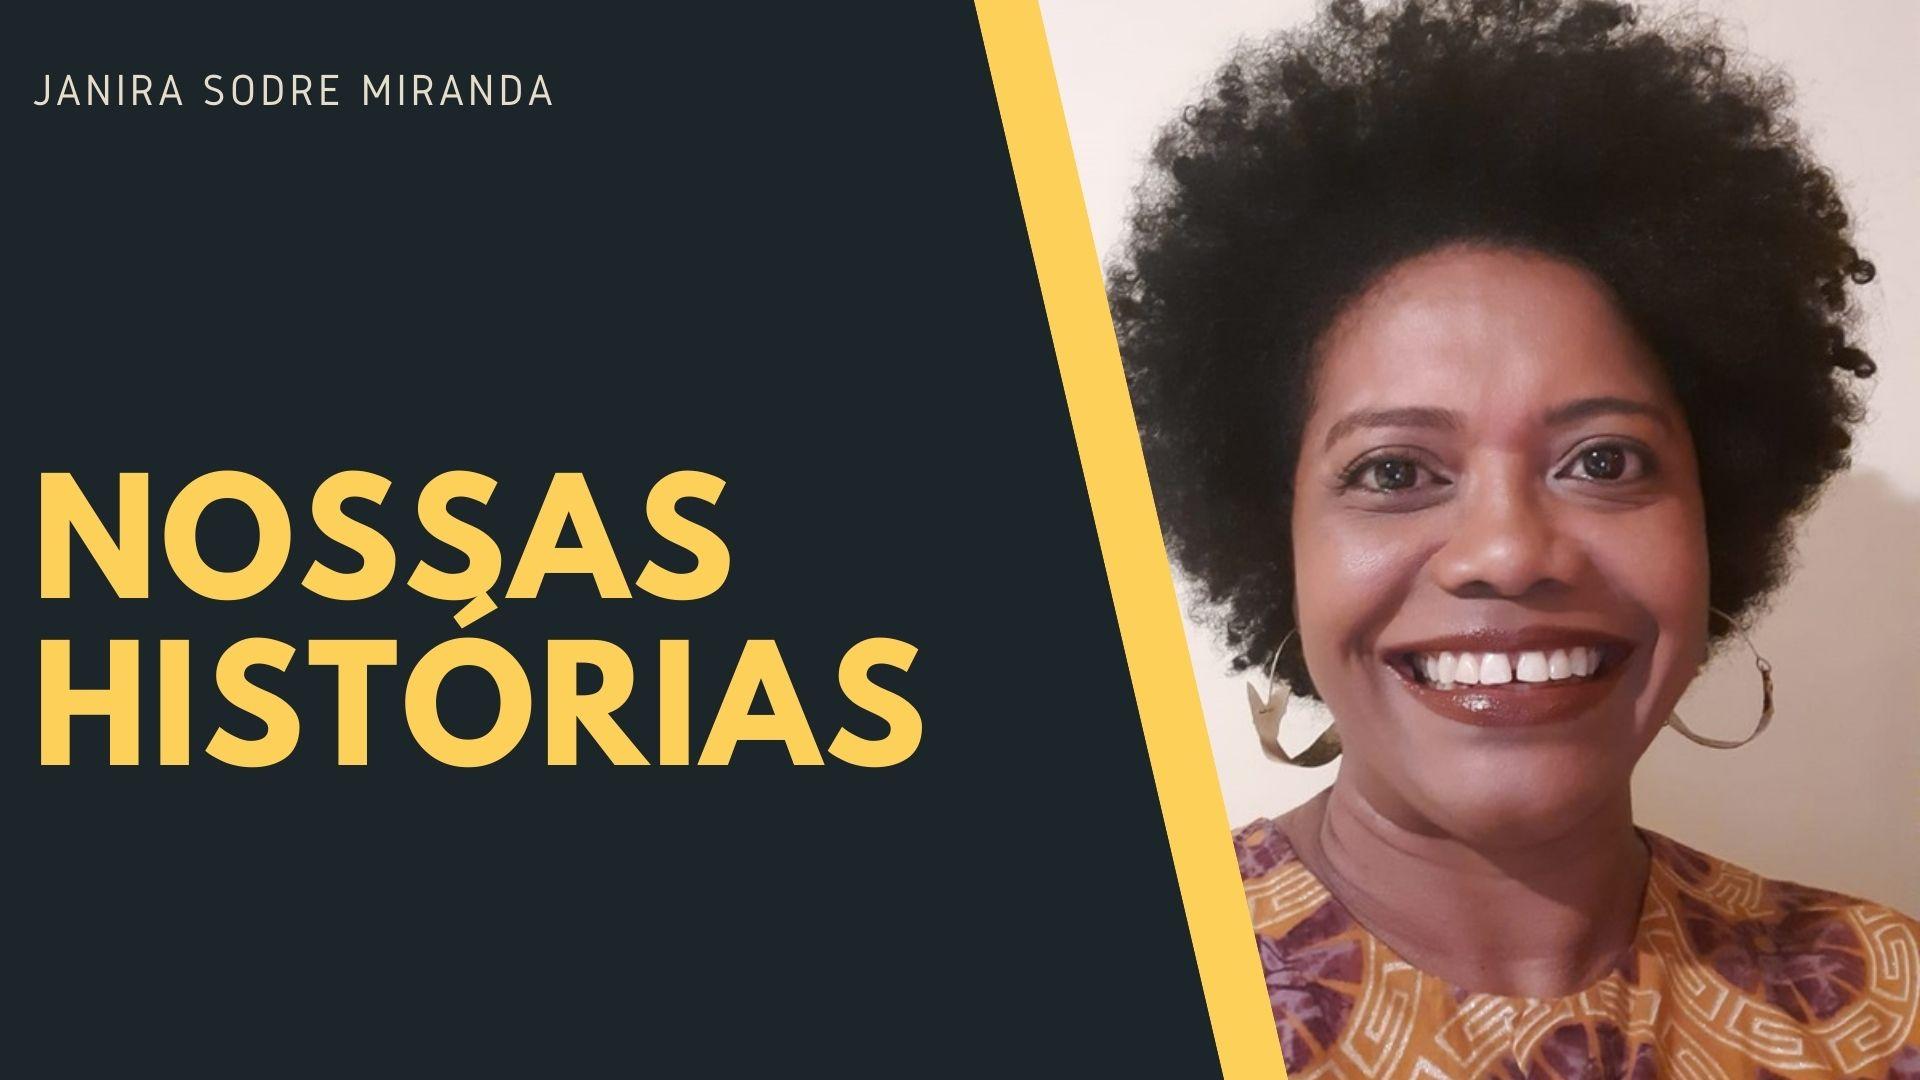 Janira Sodré Miranda (Arquivo pessoal)